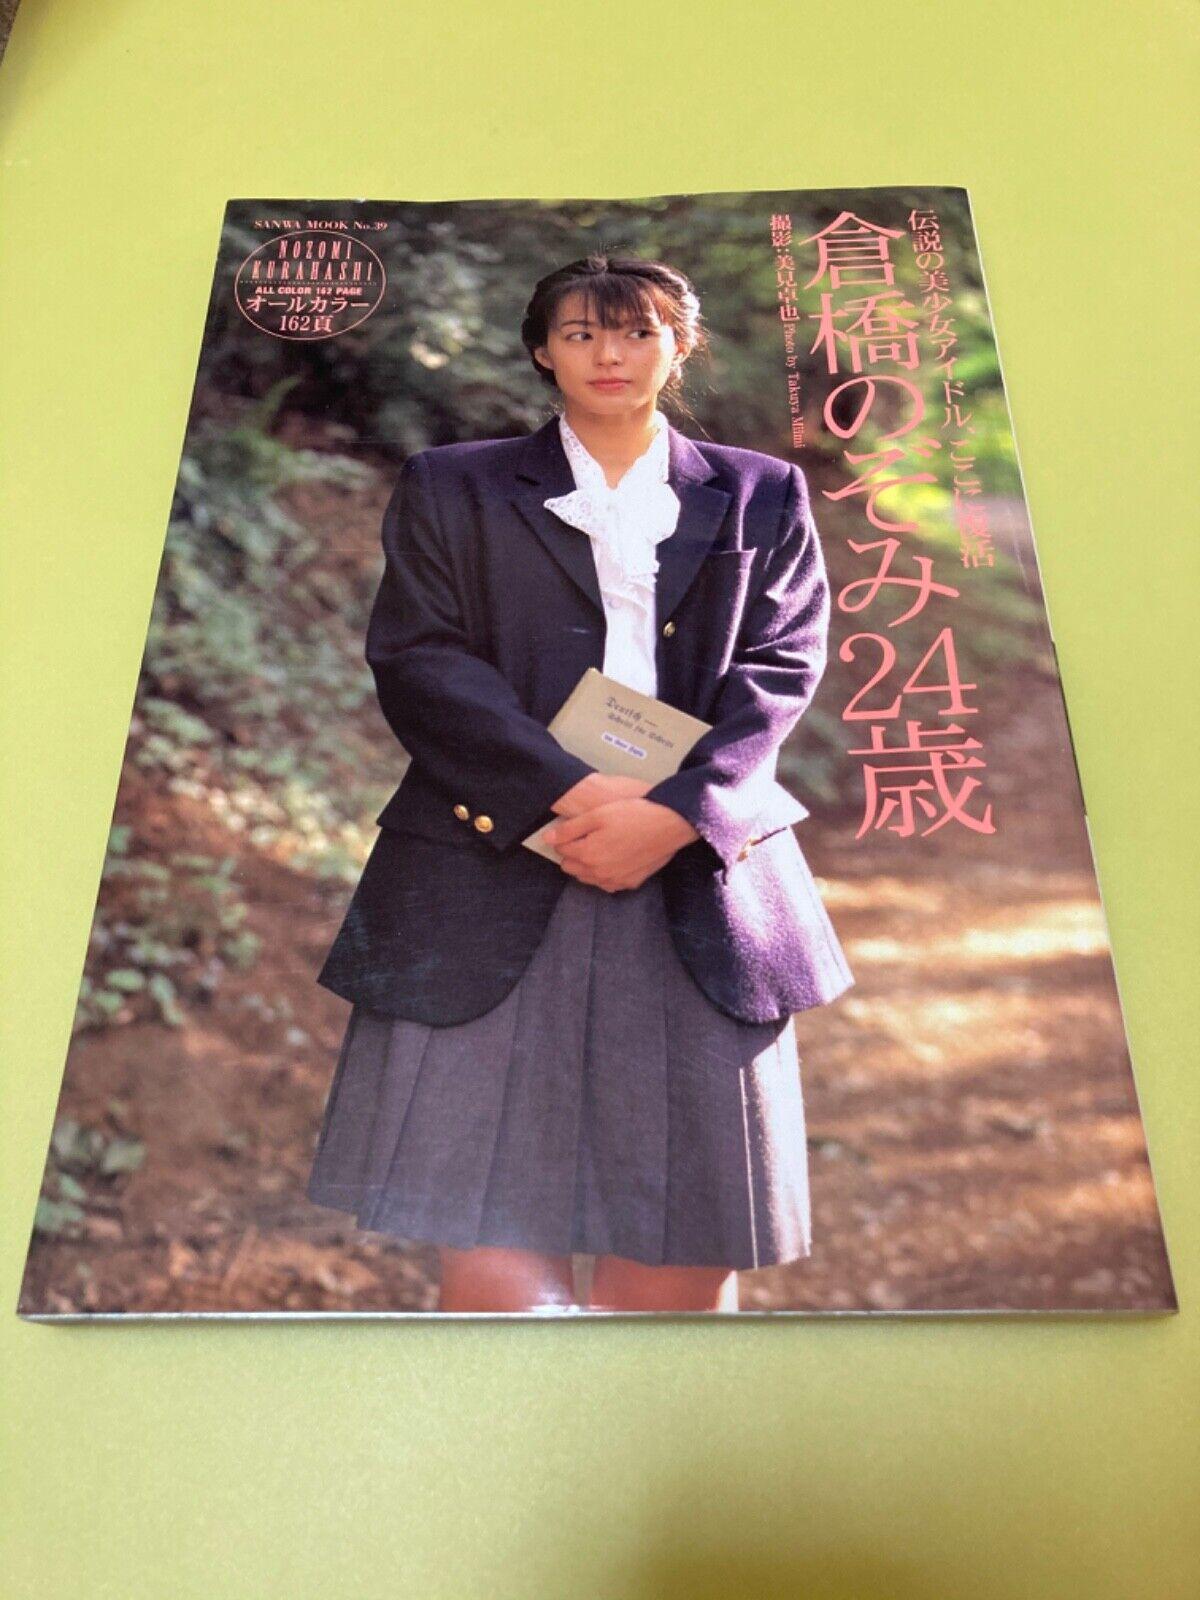 See and Save As jp nude nozomi kurahashi yo porn pict